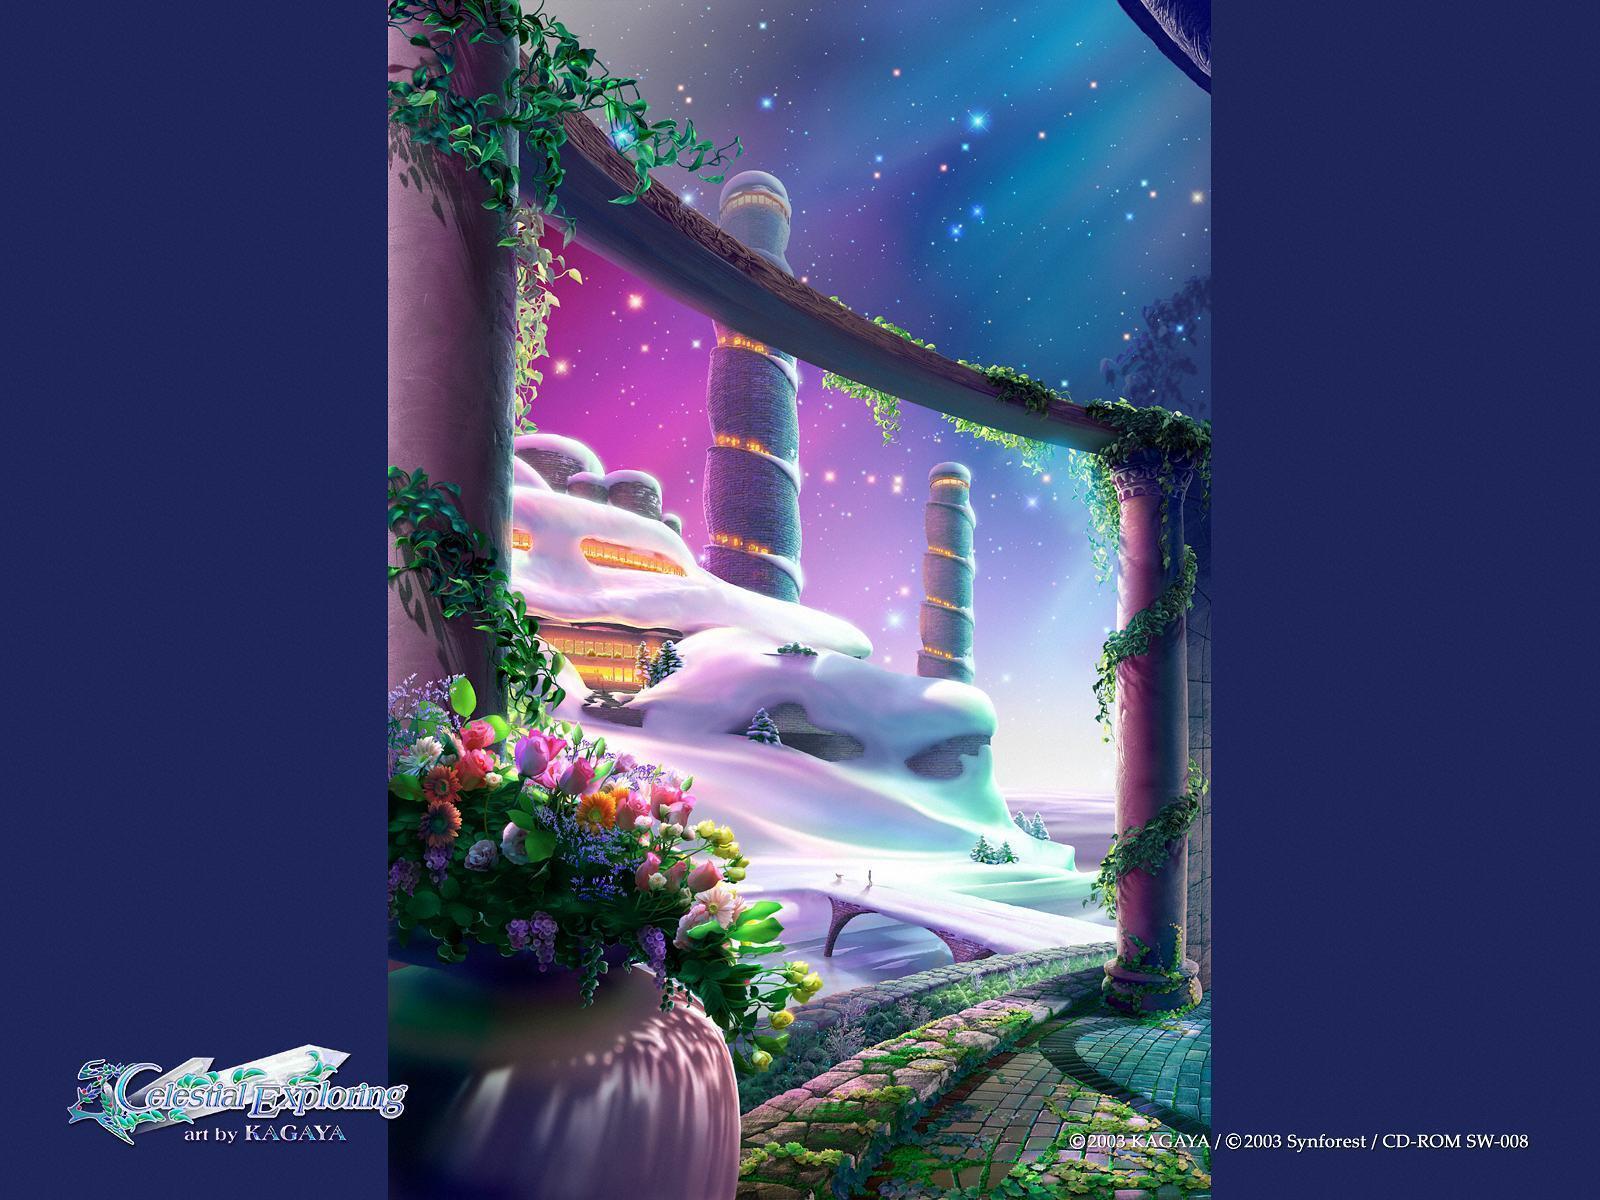 Cute Wallpapers In Full Hd Best Fantasy Wallpapers Of Author Kagaya Yutaka Fantasy